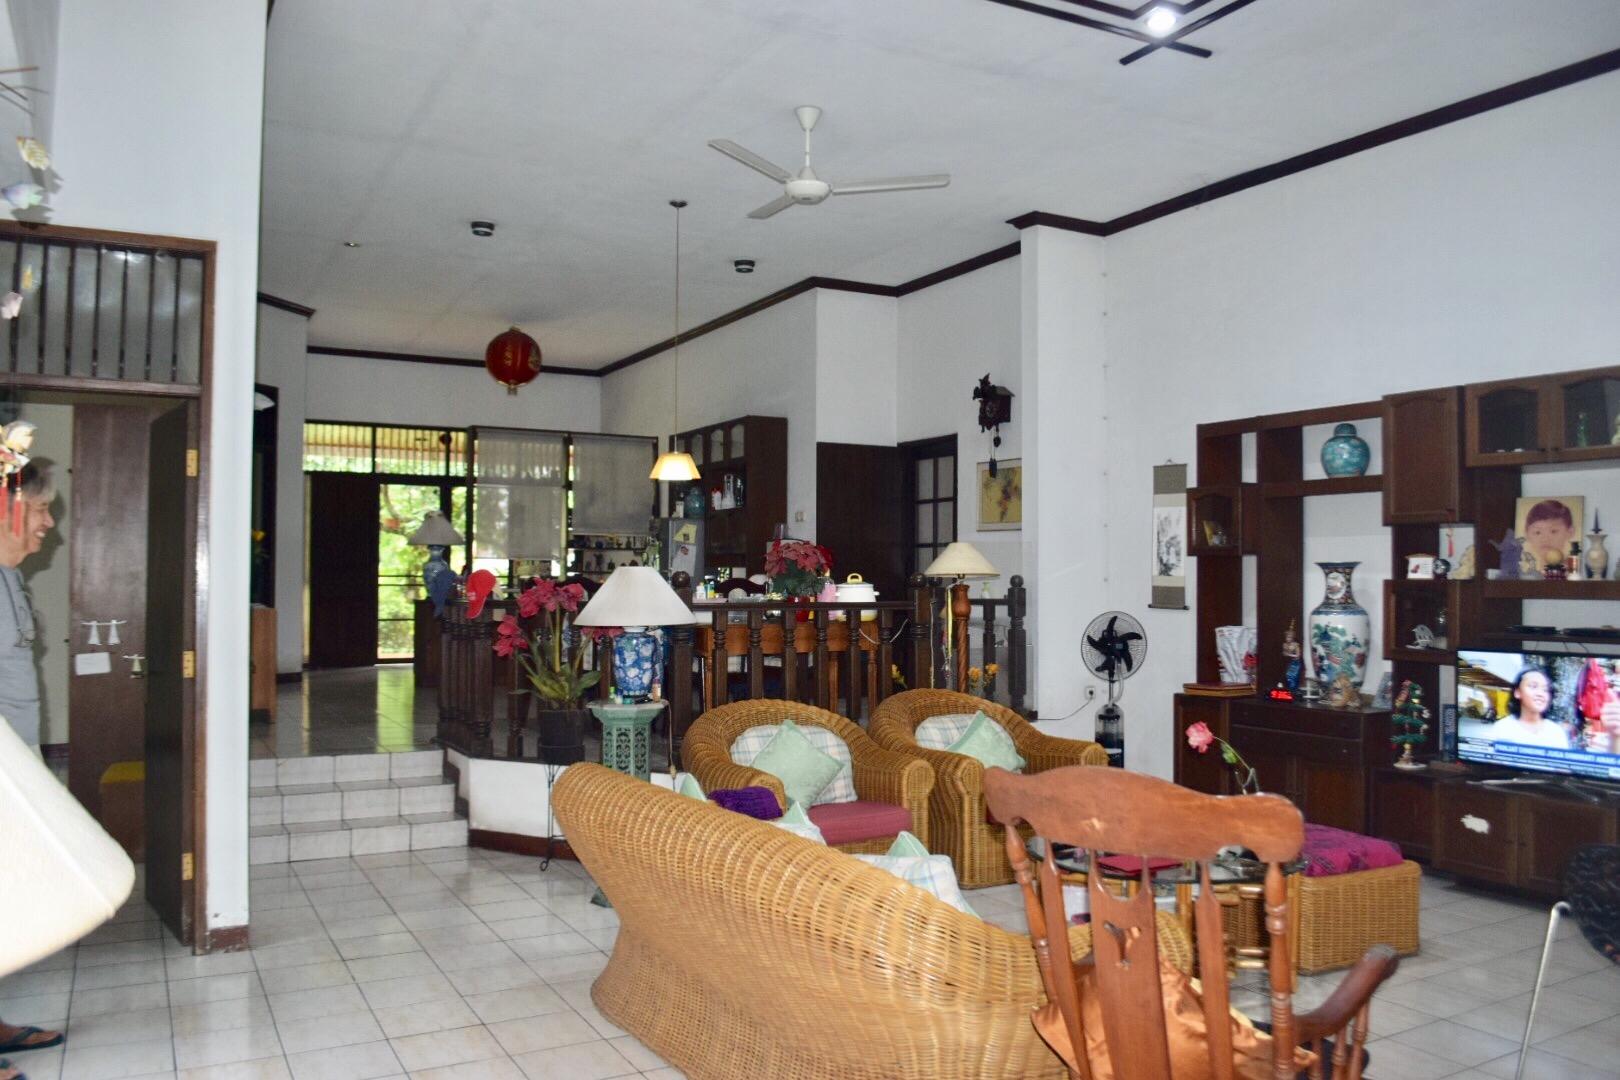 Dijual,   Rumah 1 lantai terawat rapi dan asri  di Cipete, jakarta selatan